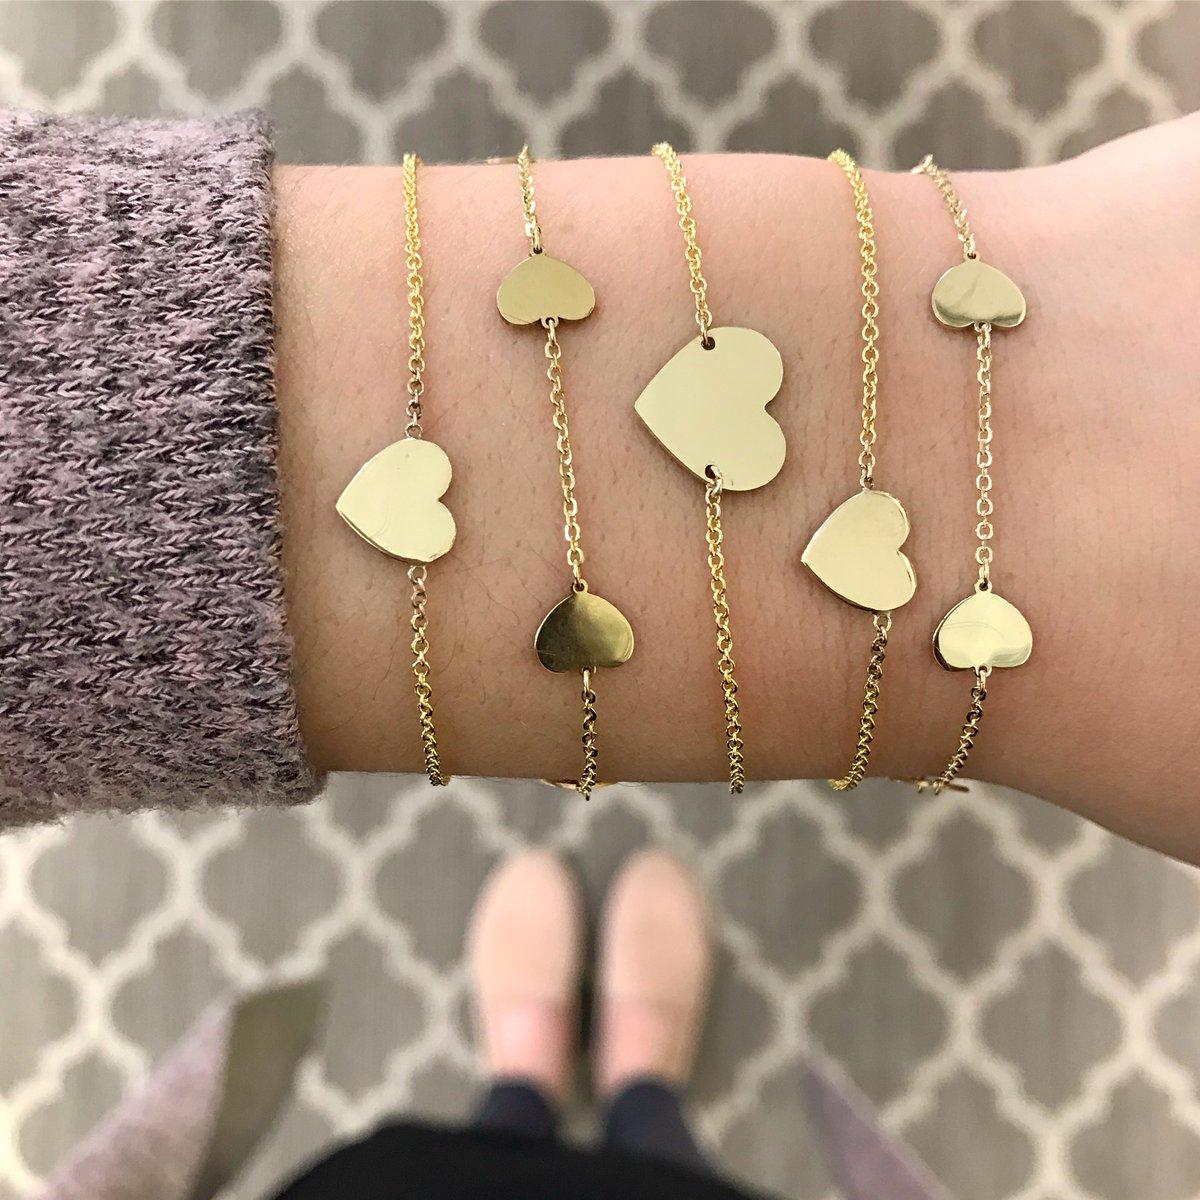 𝑾𝒆 𝒔𝒕𝒊𝒍𝒍, 𝒂𝒏𝒅 𝒂𝒍𝒘𝒂𝒚𝒔 𝒘𝒊𝒍𝒍, 𝒉𝒂𝒗𝒆 𝒍𝒐𝒗𝒆.  #loveisnotcancelled #itisjv #heartjewelry #bracelets #love #COVID19 #styles #fashion #jewelryaddict #FridayThoughts #FridayFeeling